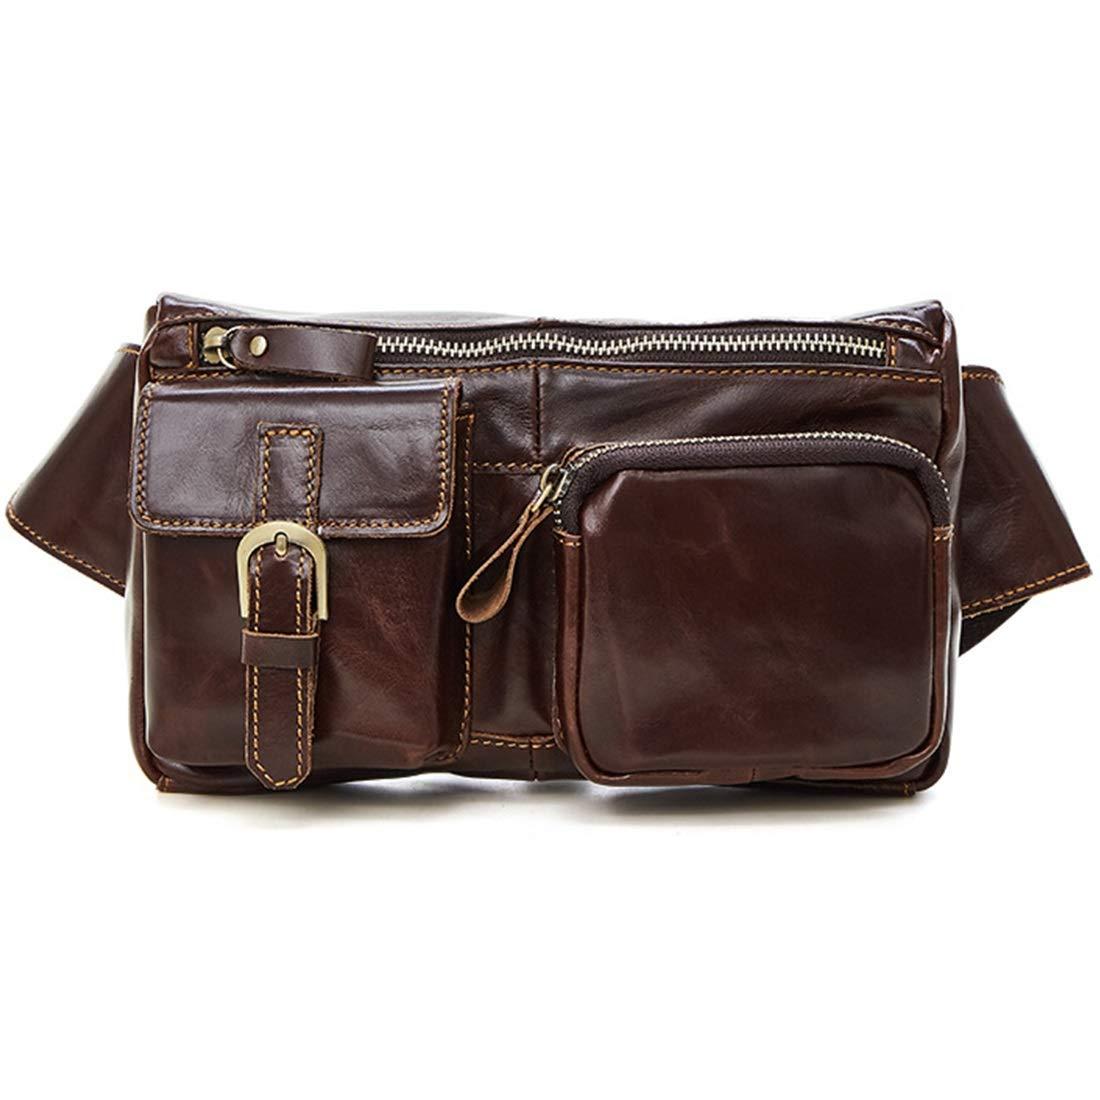 RABILTY Leather Belt Bag Color : Coffee Color Men Genuine Leather Wallet Cellphone Waist Bag Mini Travel Messager Pouch Crossbody Bag Pack Purse Wallet